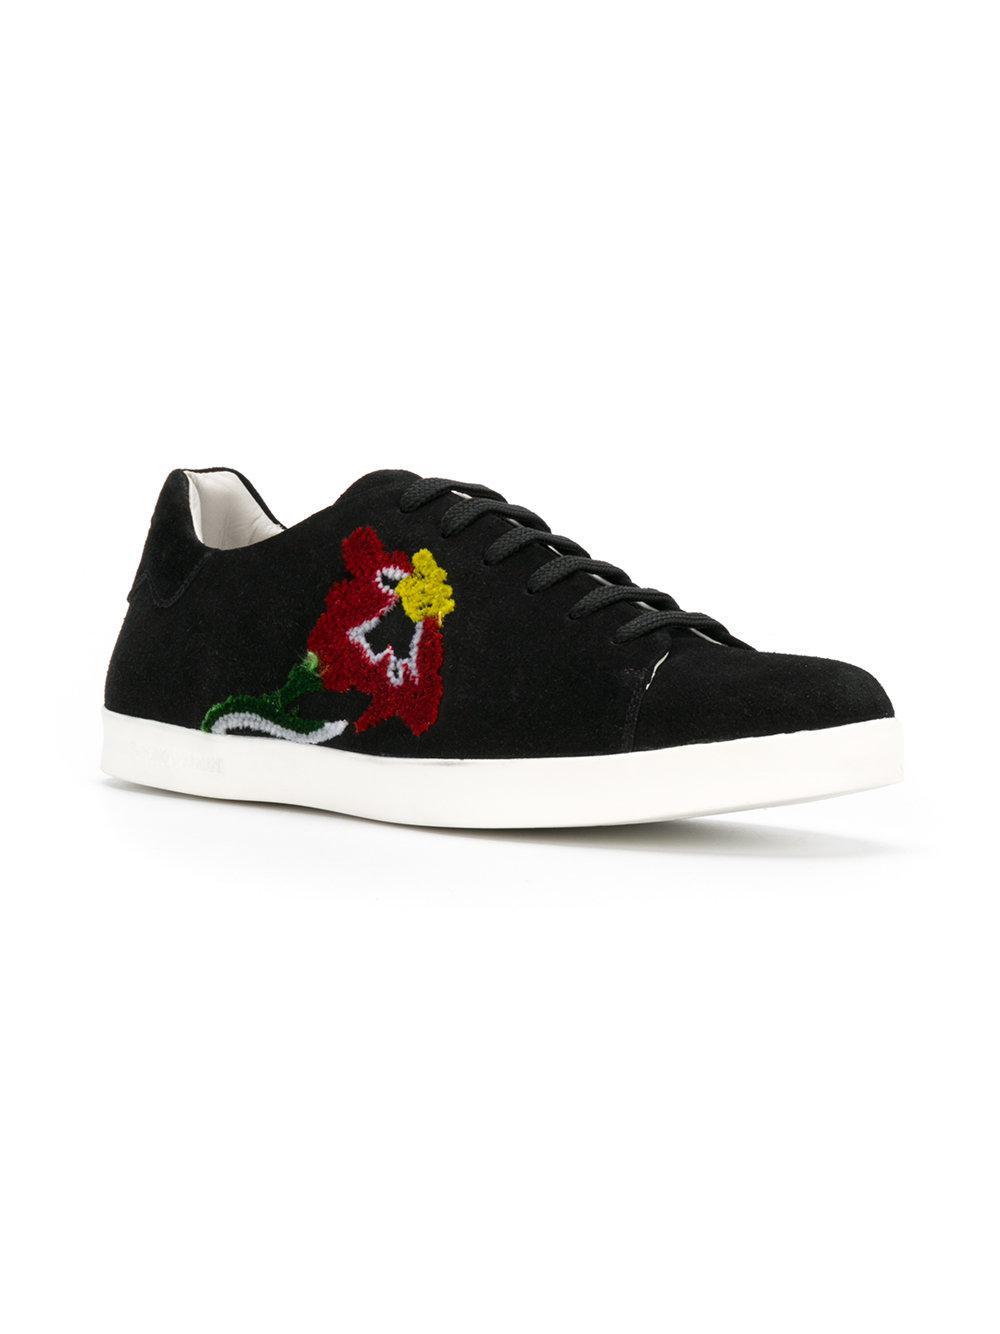 Armani Flower embroidered sneakers 4j6mZIxAjd